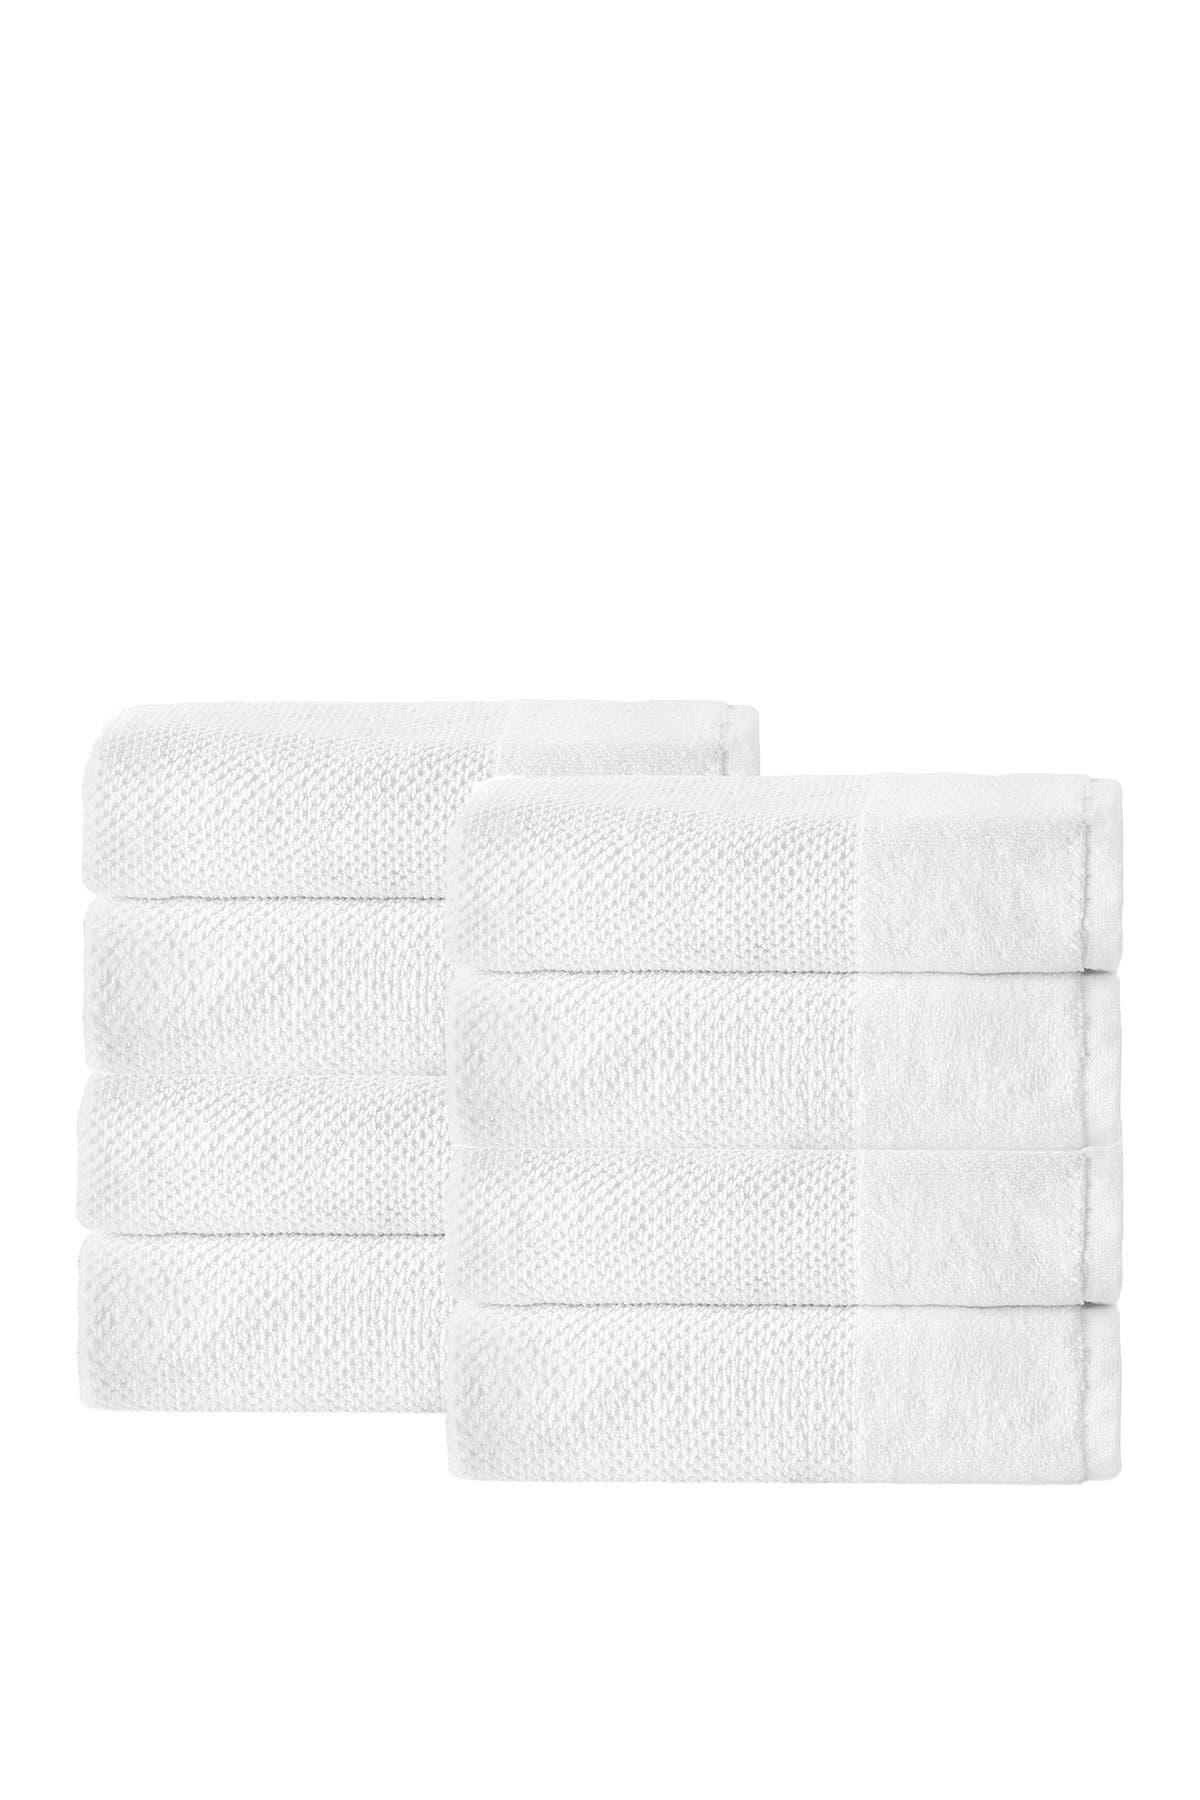 Image of ENCHANTE HOME Incanto Turkish Cotton Hand Towel - White - Set of 8